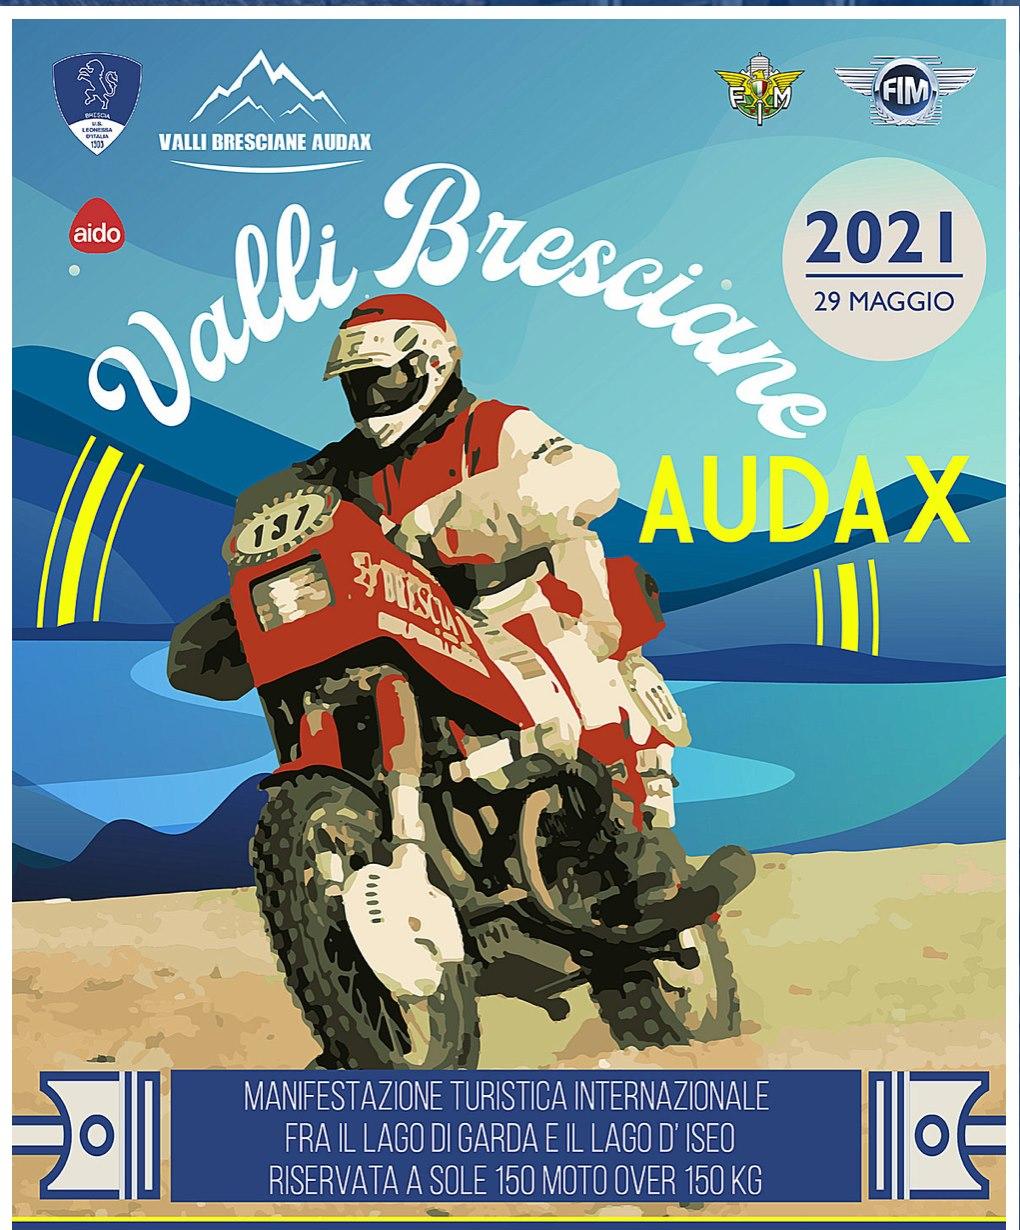 italiainpiega-evento-moto off road 2021-valli bresciane audax